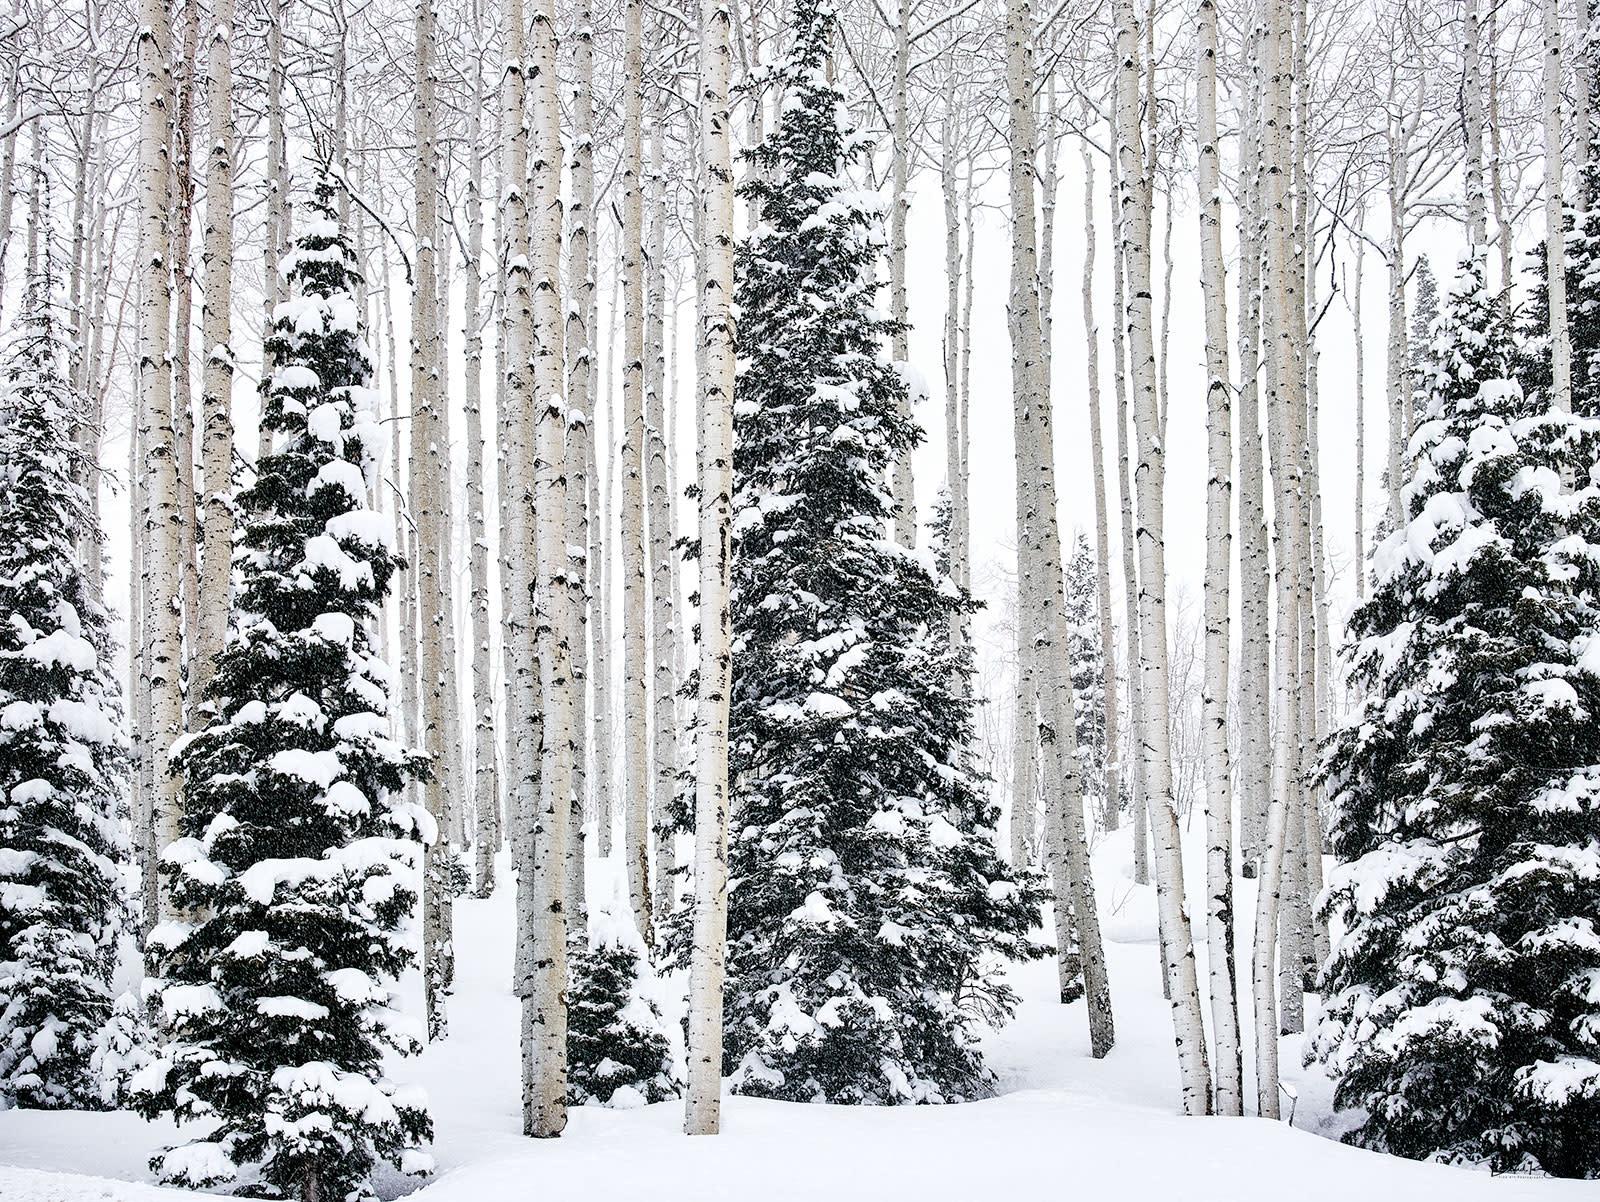 Winter forest bsna7w